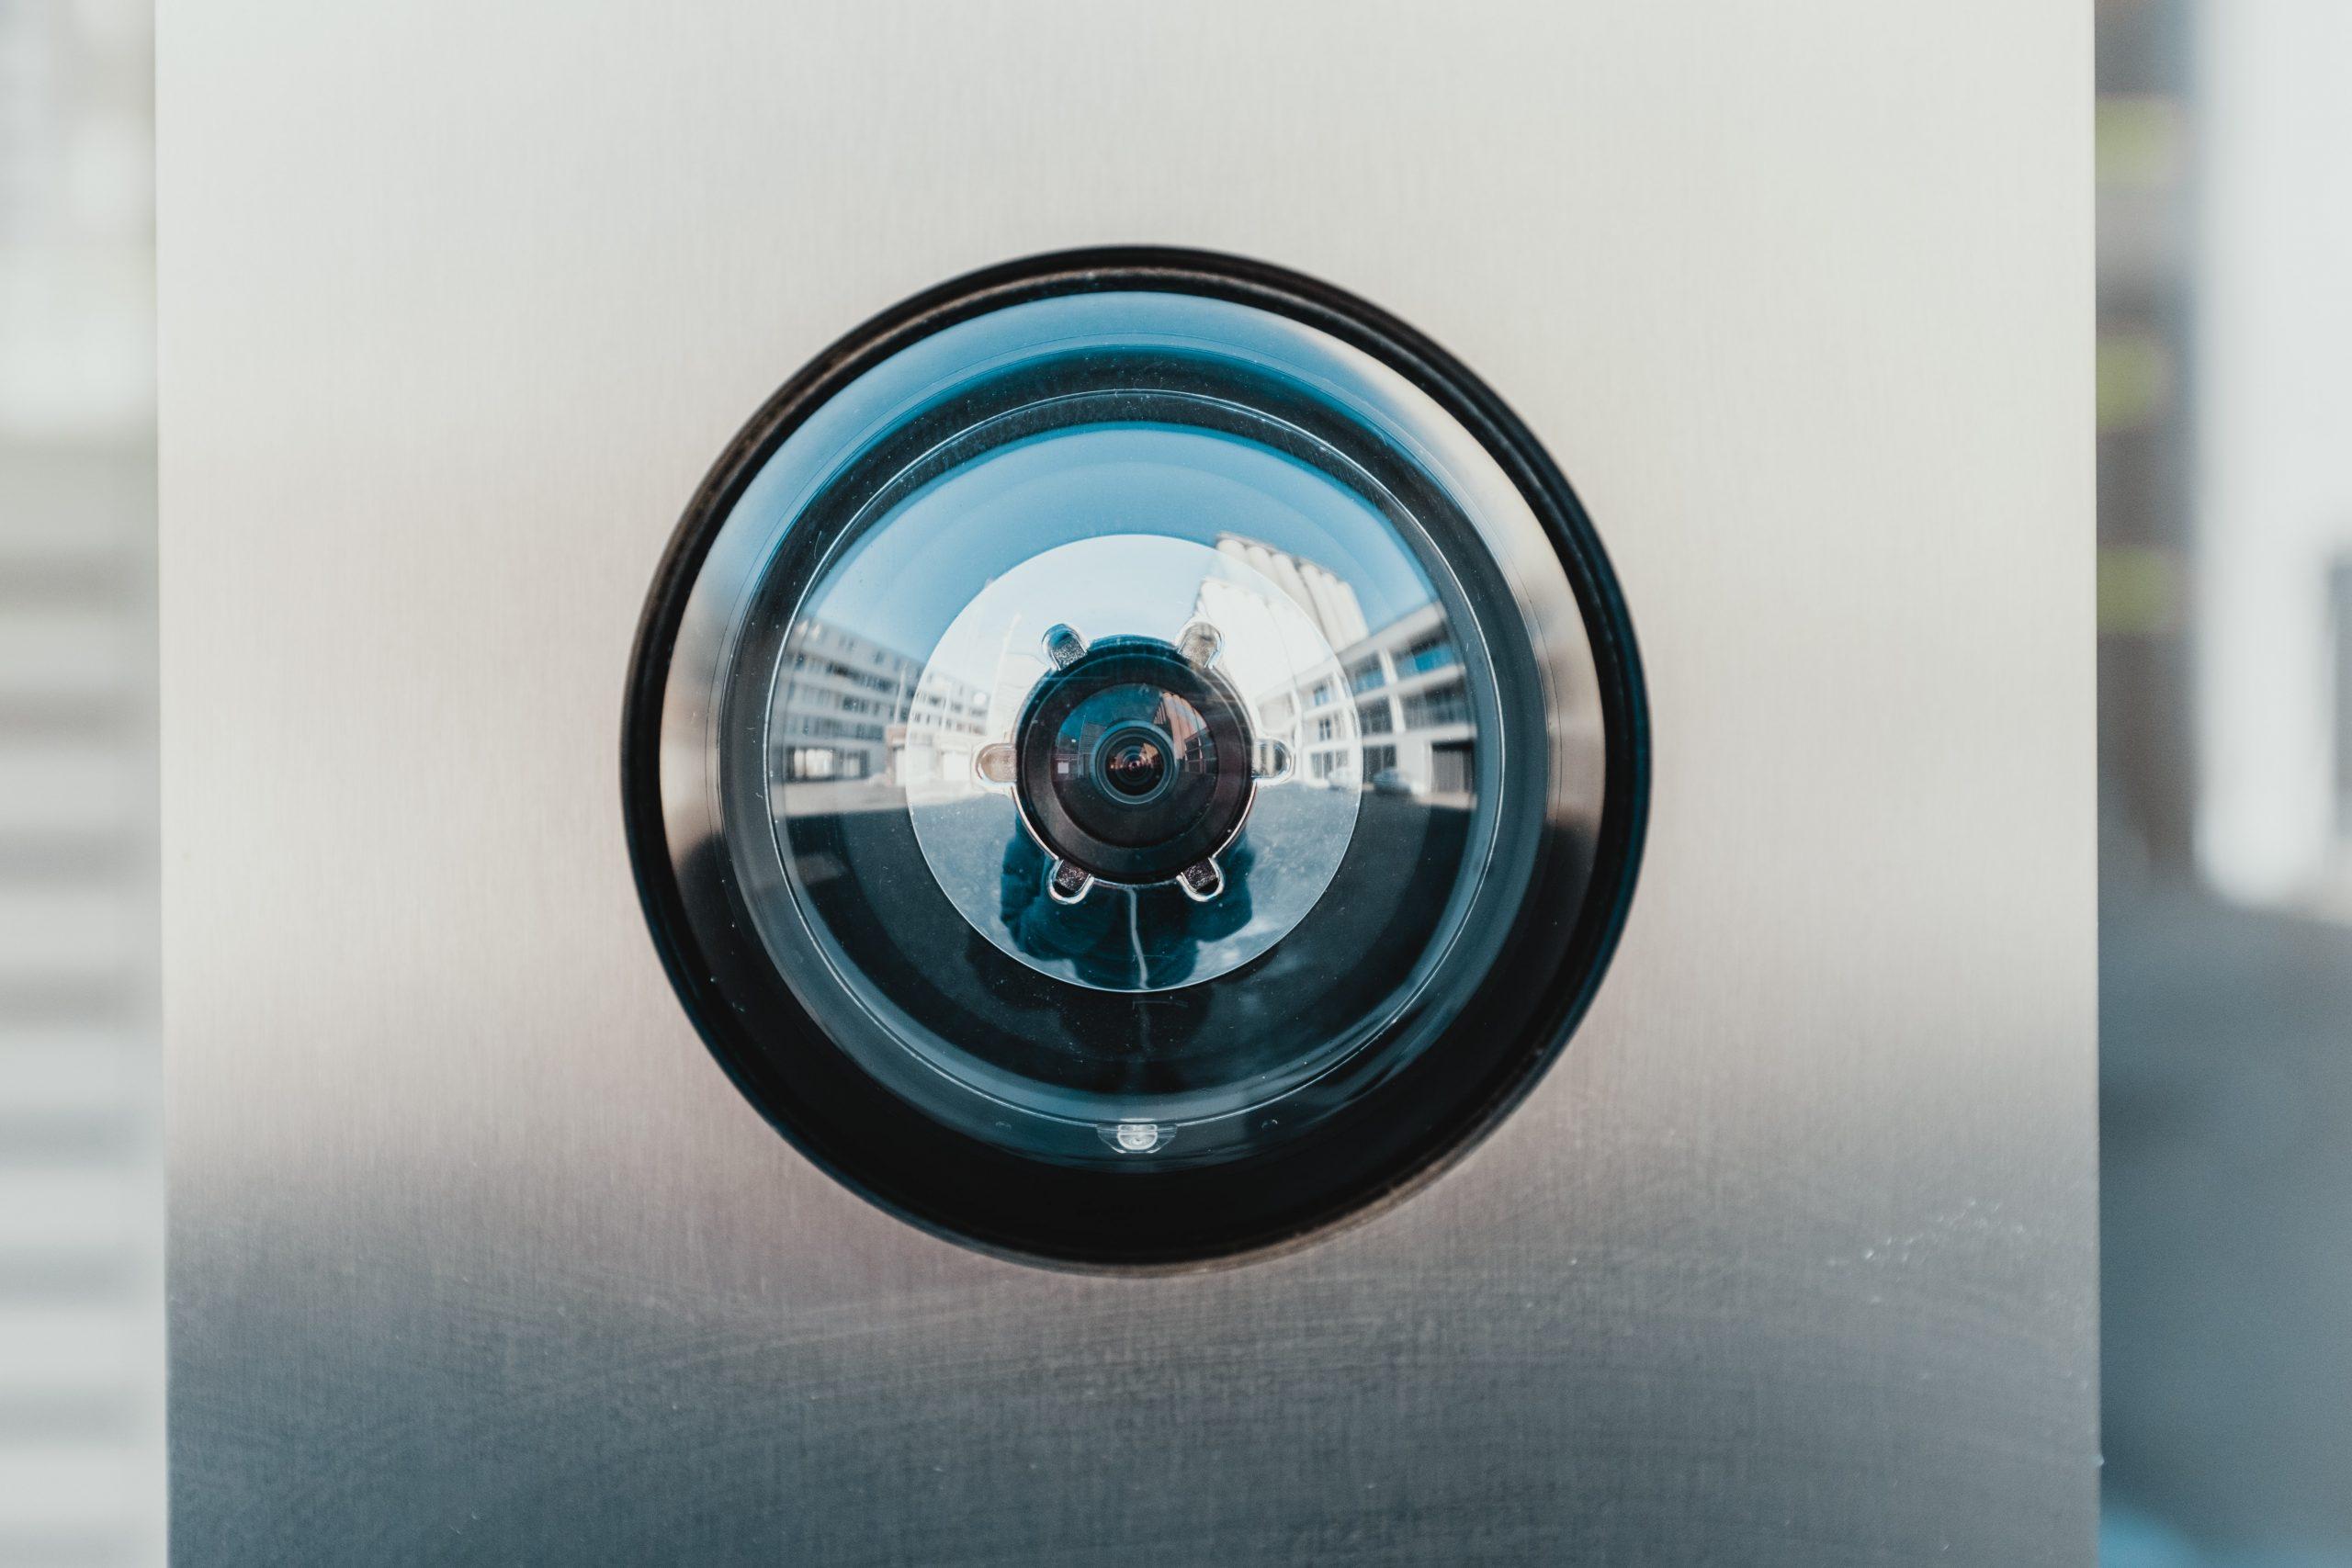 kamera thermal, kamera cctv, cctv pengukur suhu